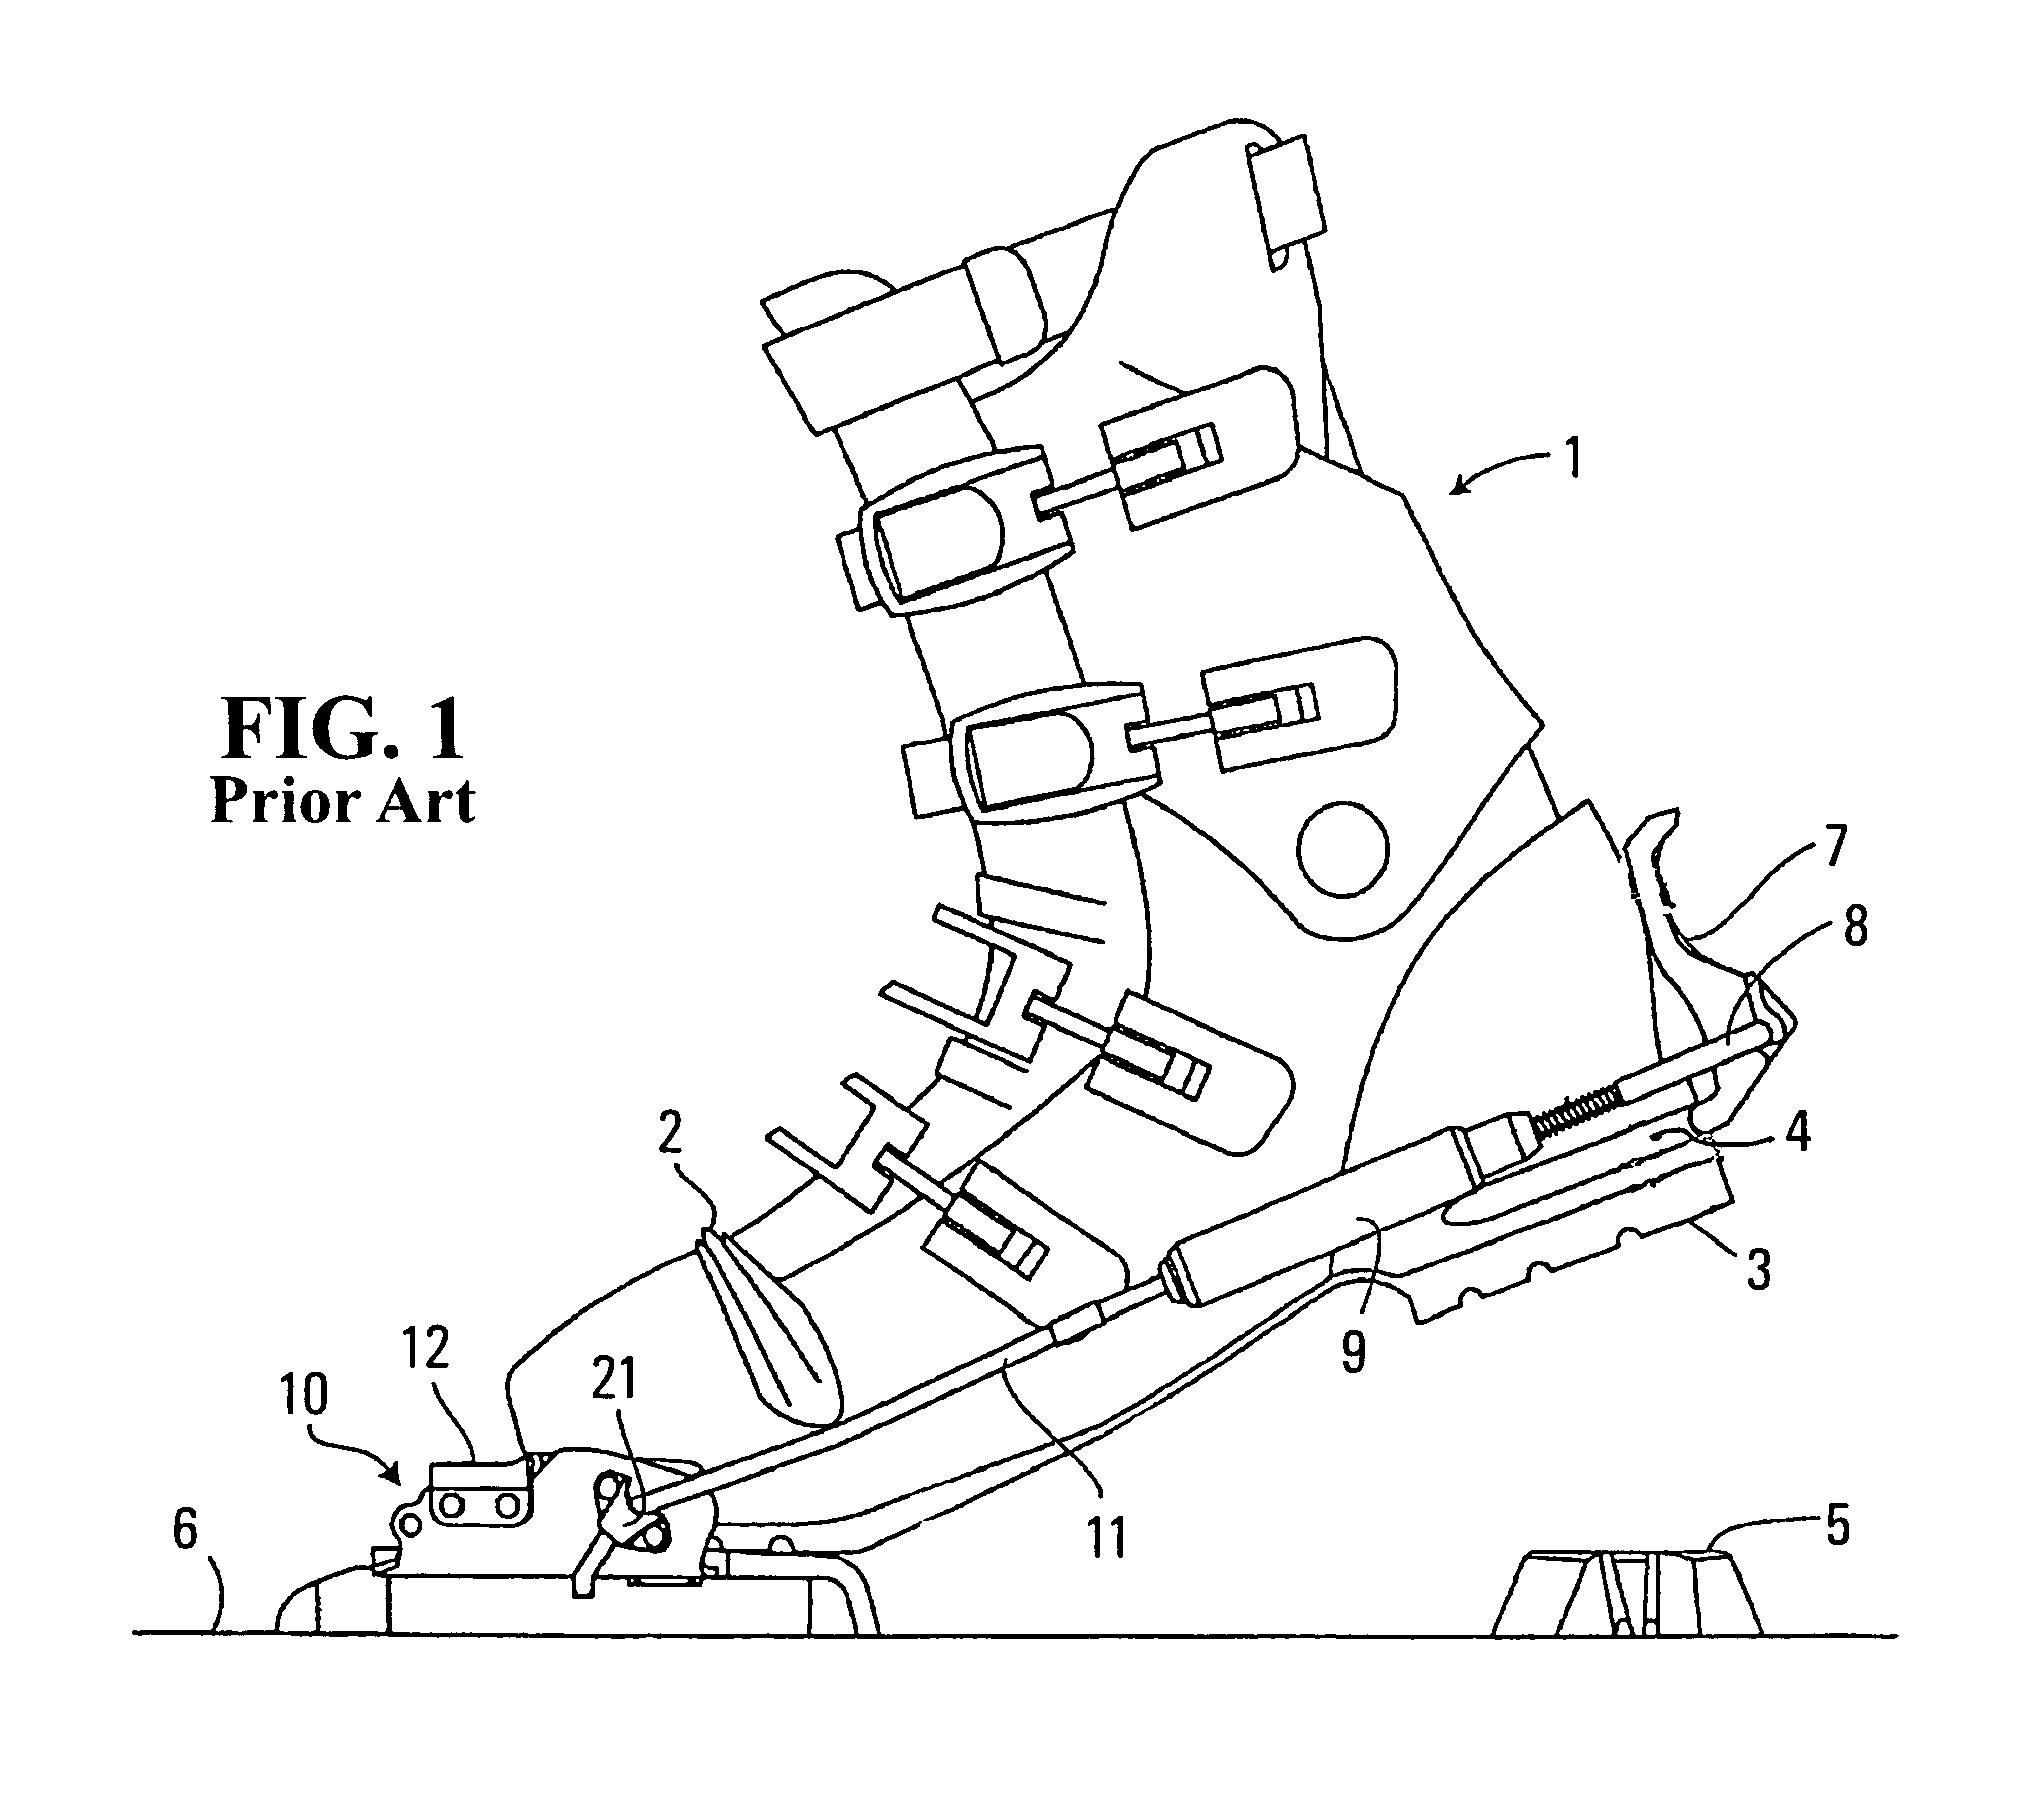 Pivoting telemark ski binding, ski crampon, and heel lifter.png